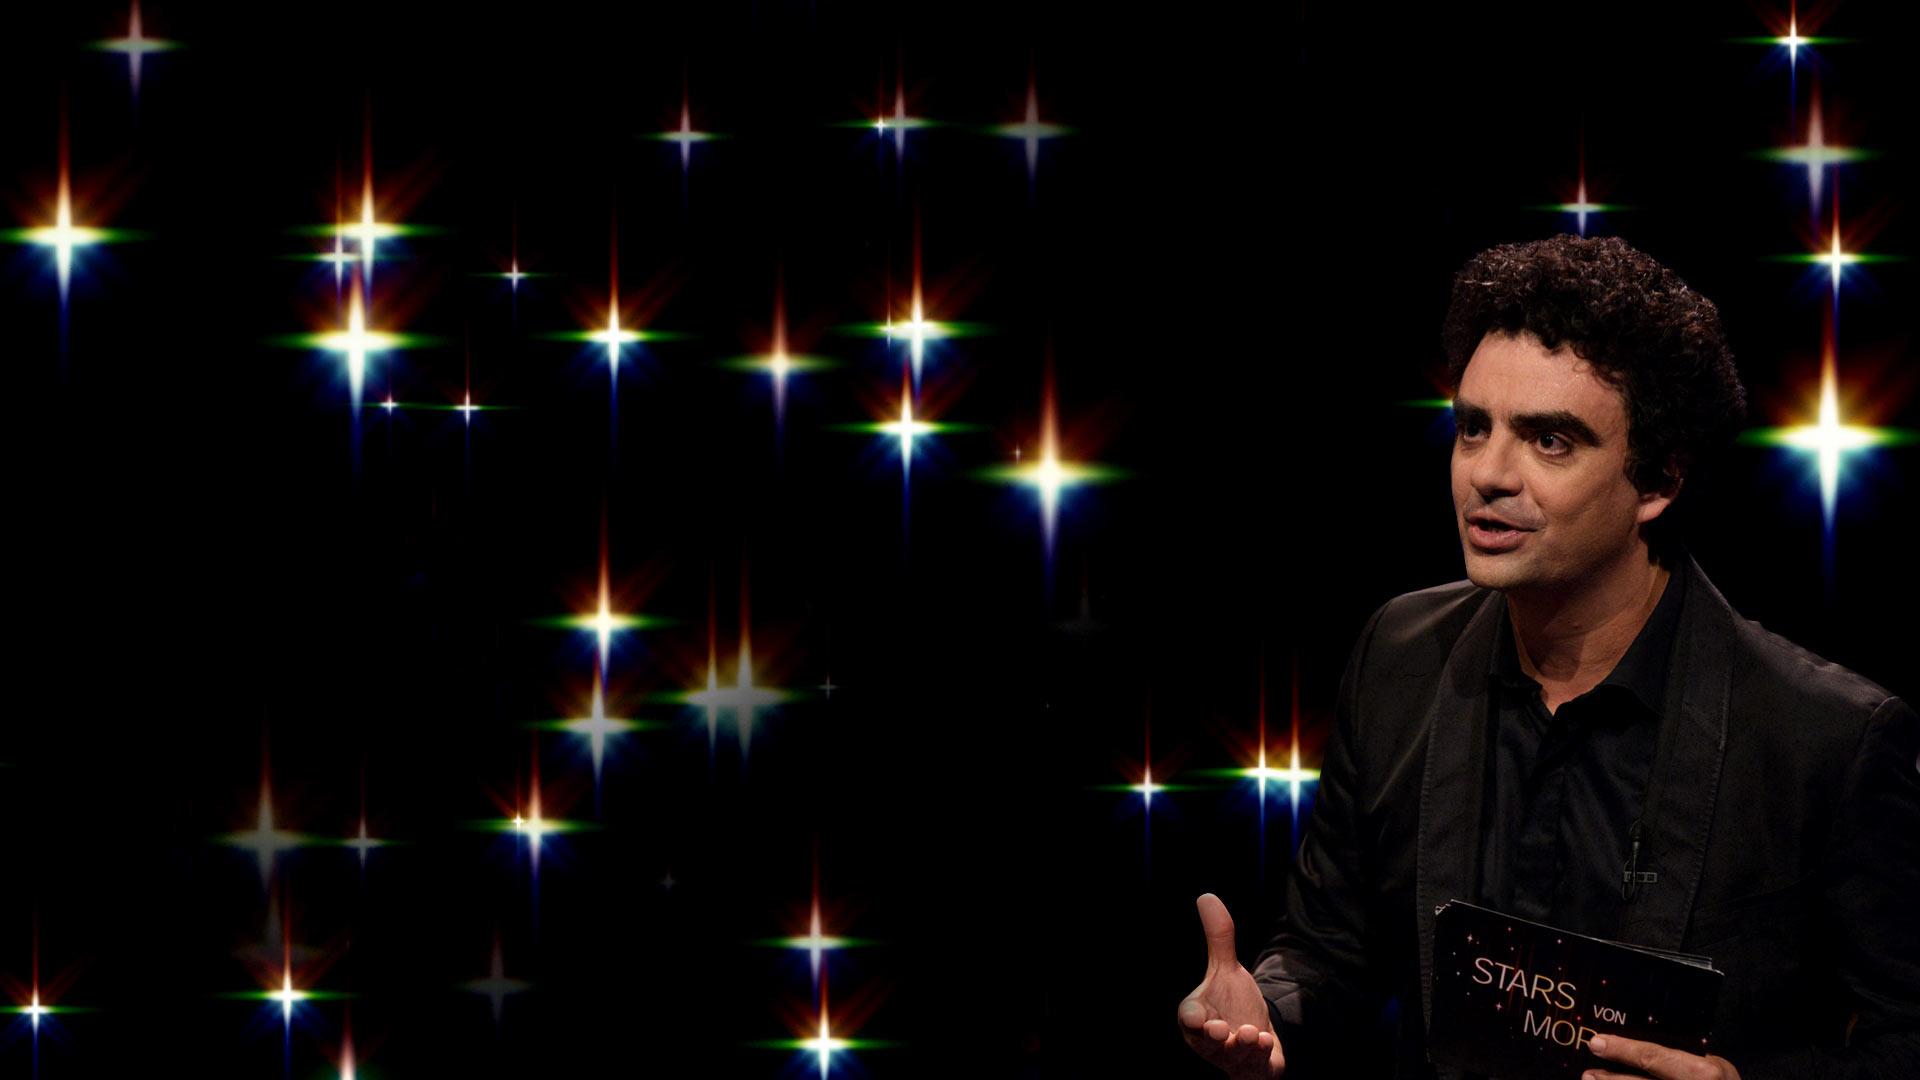 Stars von morgen Rolando Villazon Burak Ozdemir Musica Sequenza Sampling Baroque 1